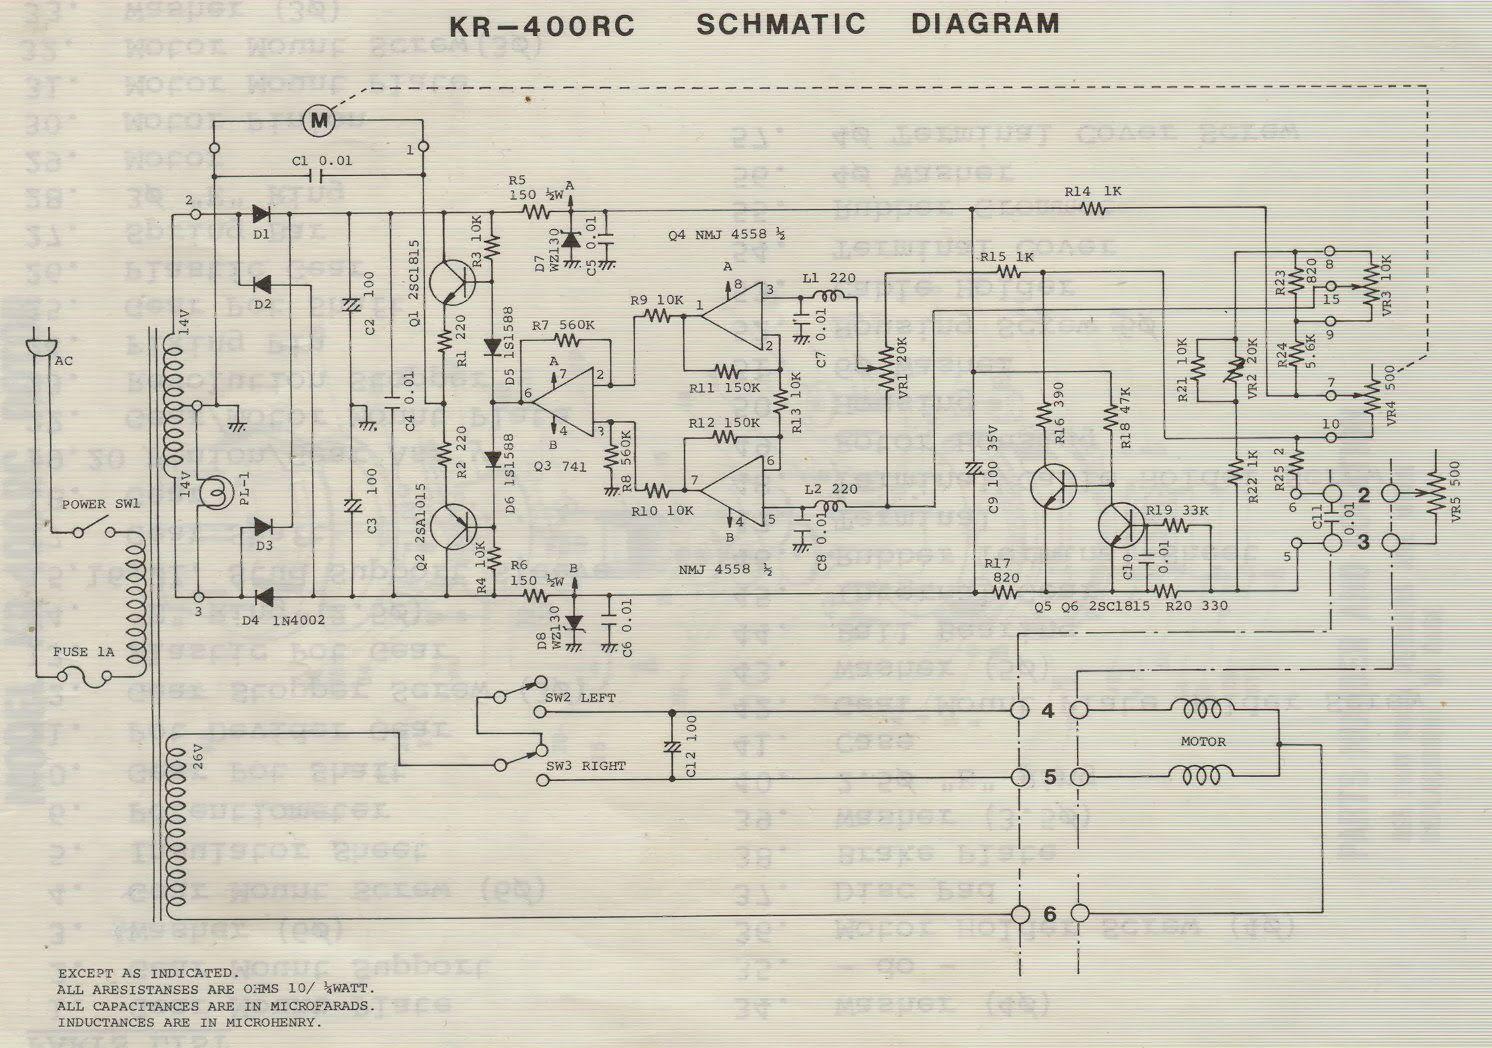 M0pkz Ly3k Blog Antenna Rotator Kr 400rc Control Unit Schematic Hid Electronic Ballast Circuit Diagram Basiccircuit